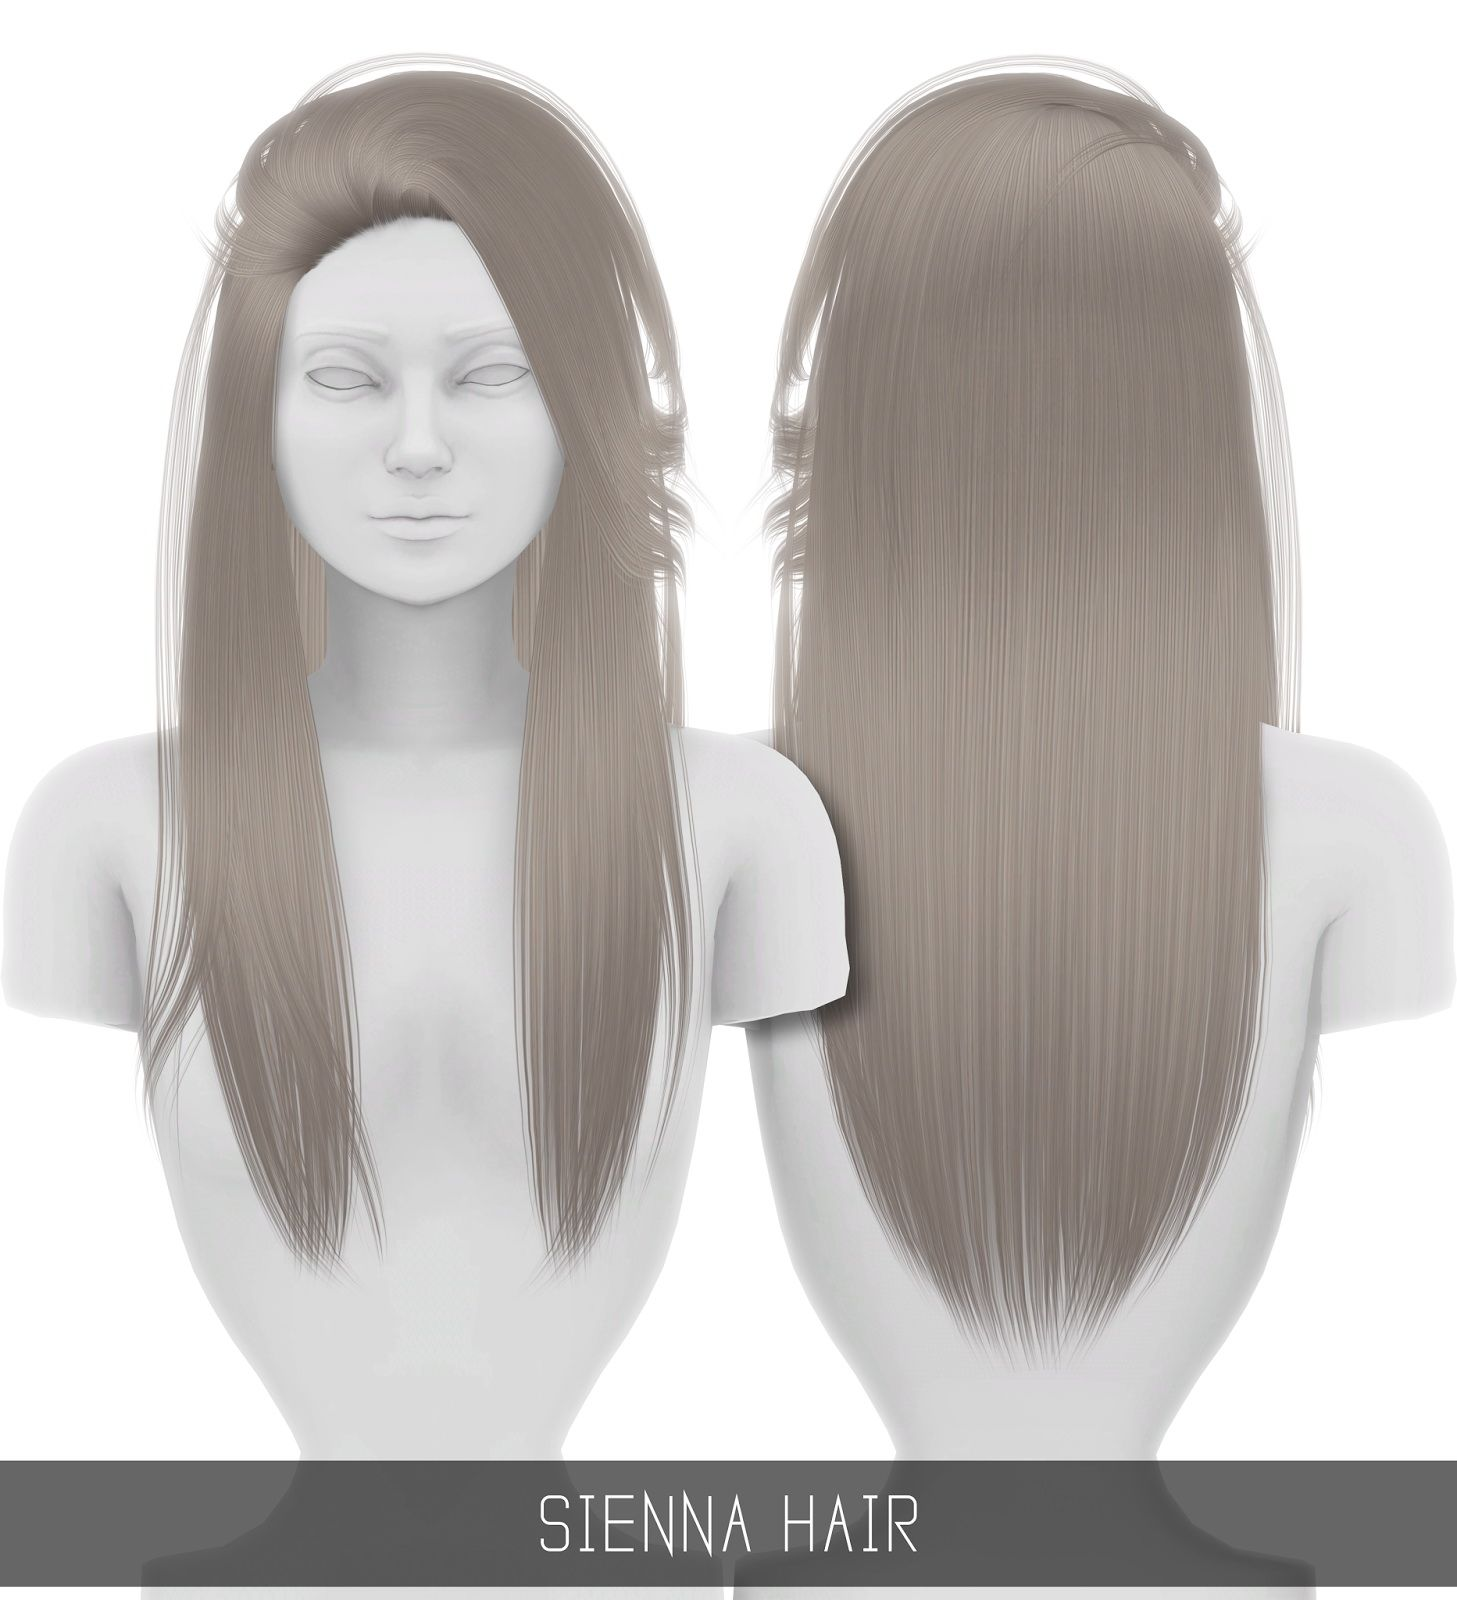 Simpliciaty Sienna hair Pinterest